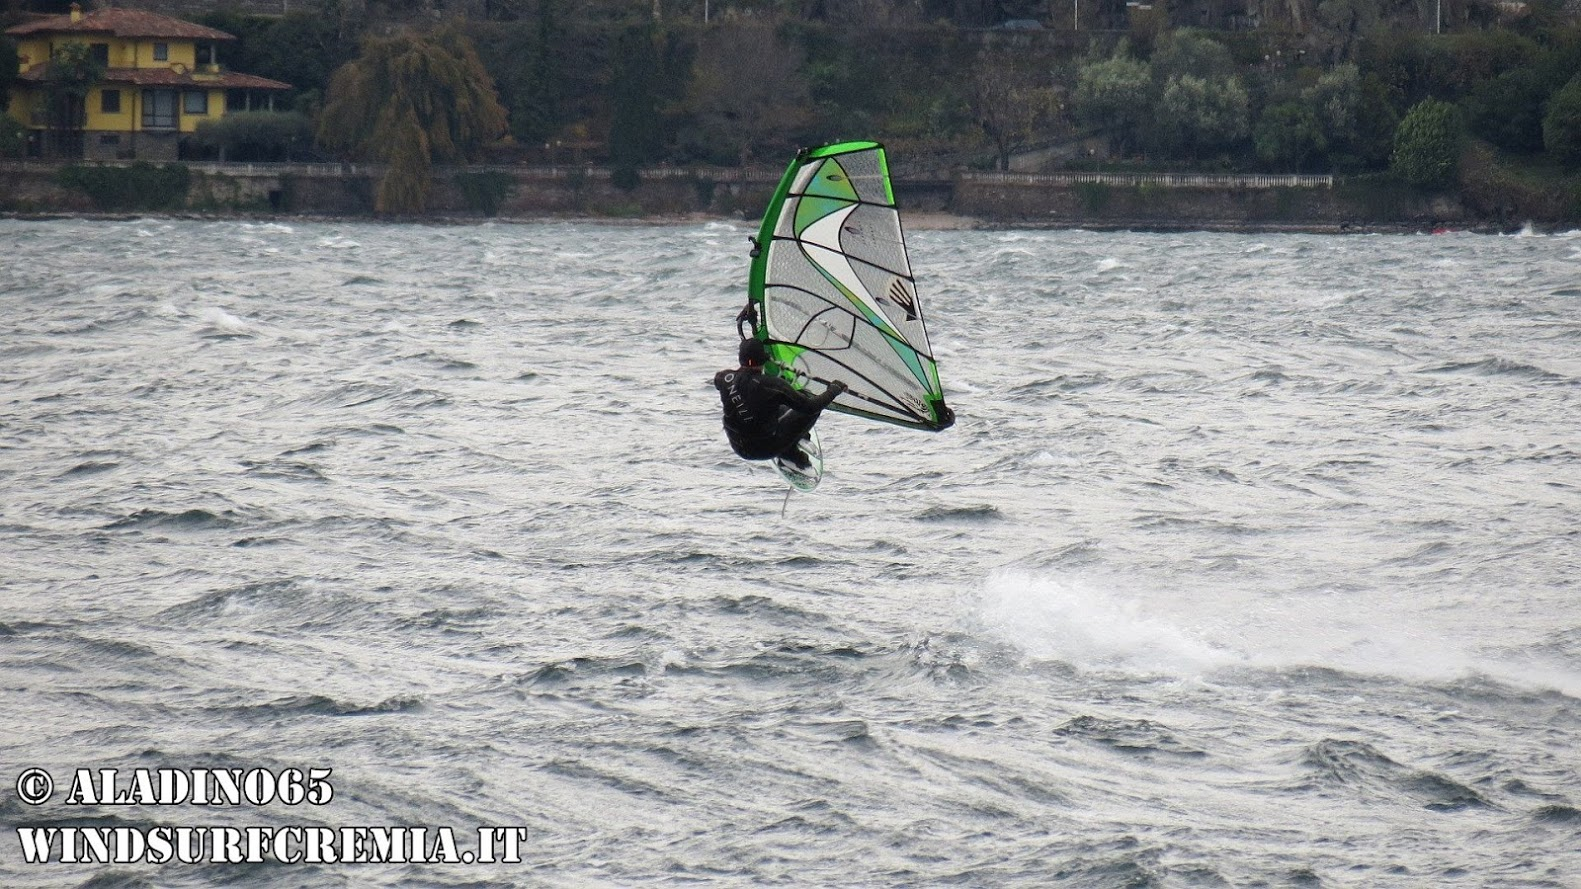 windsurf_cremia_13112017_022.jpg